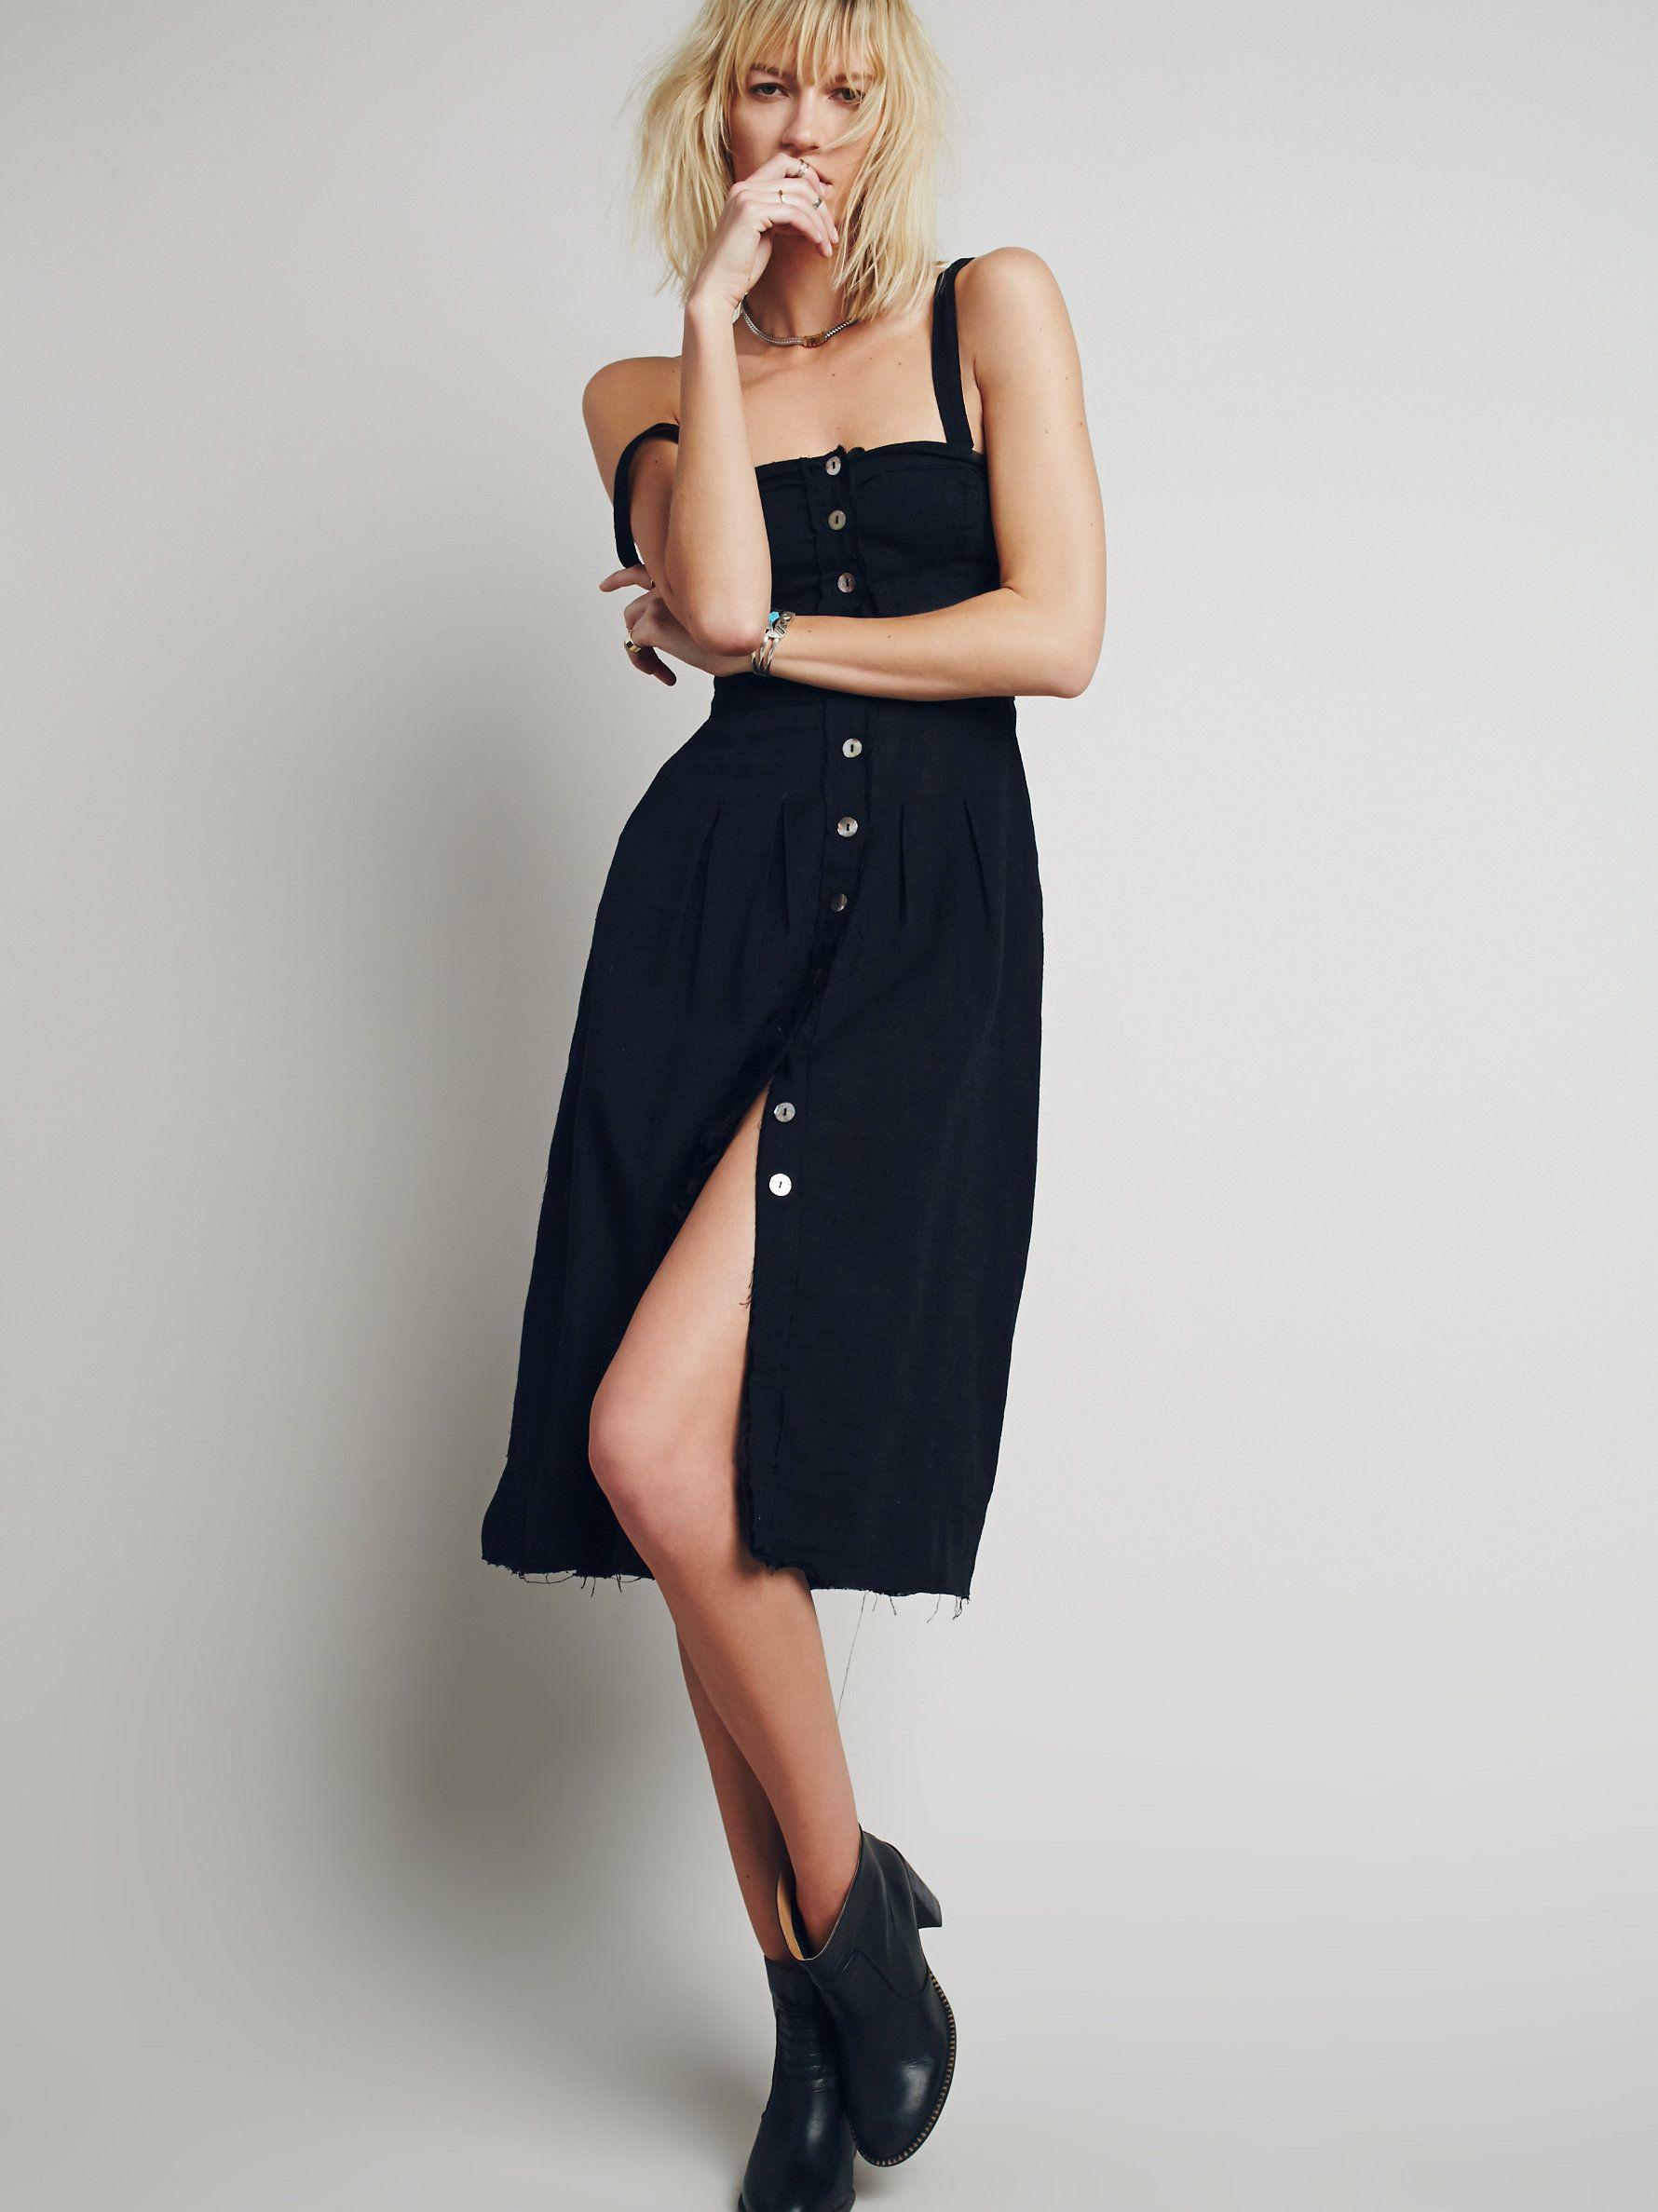 Girlfriend material dress easy breezy lightweight midi dress